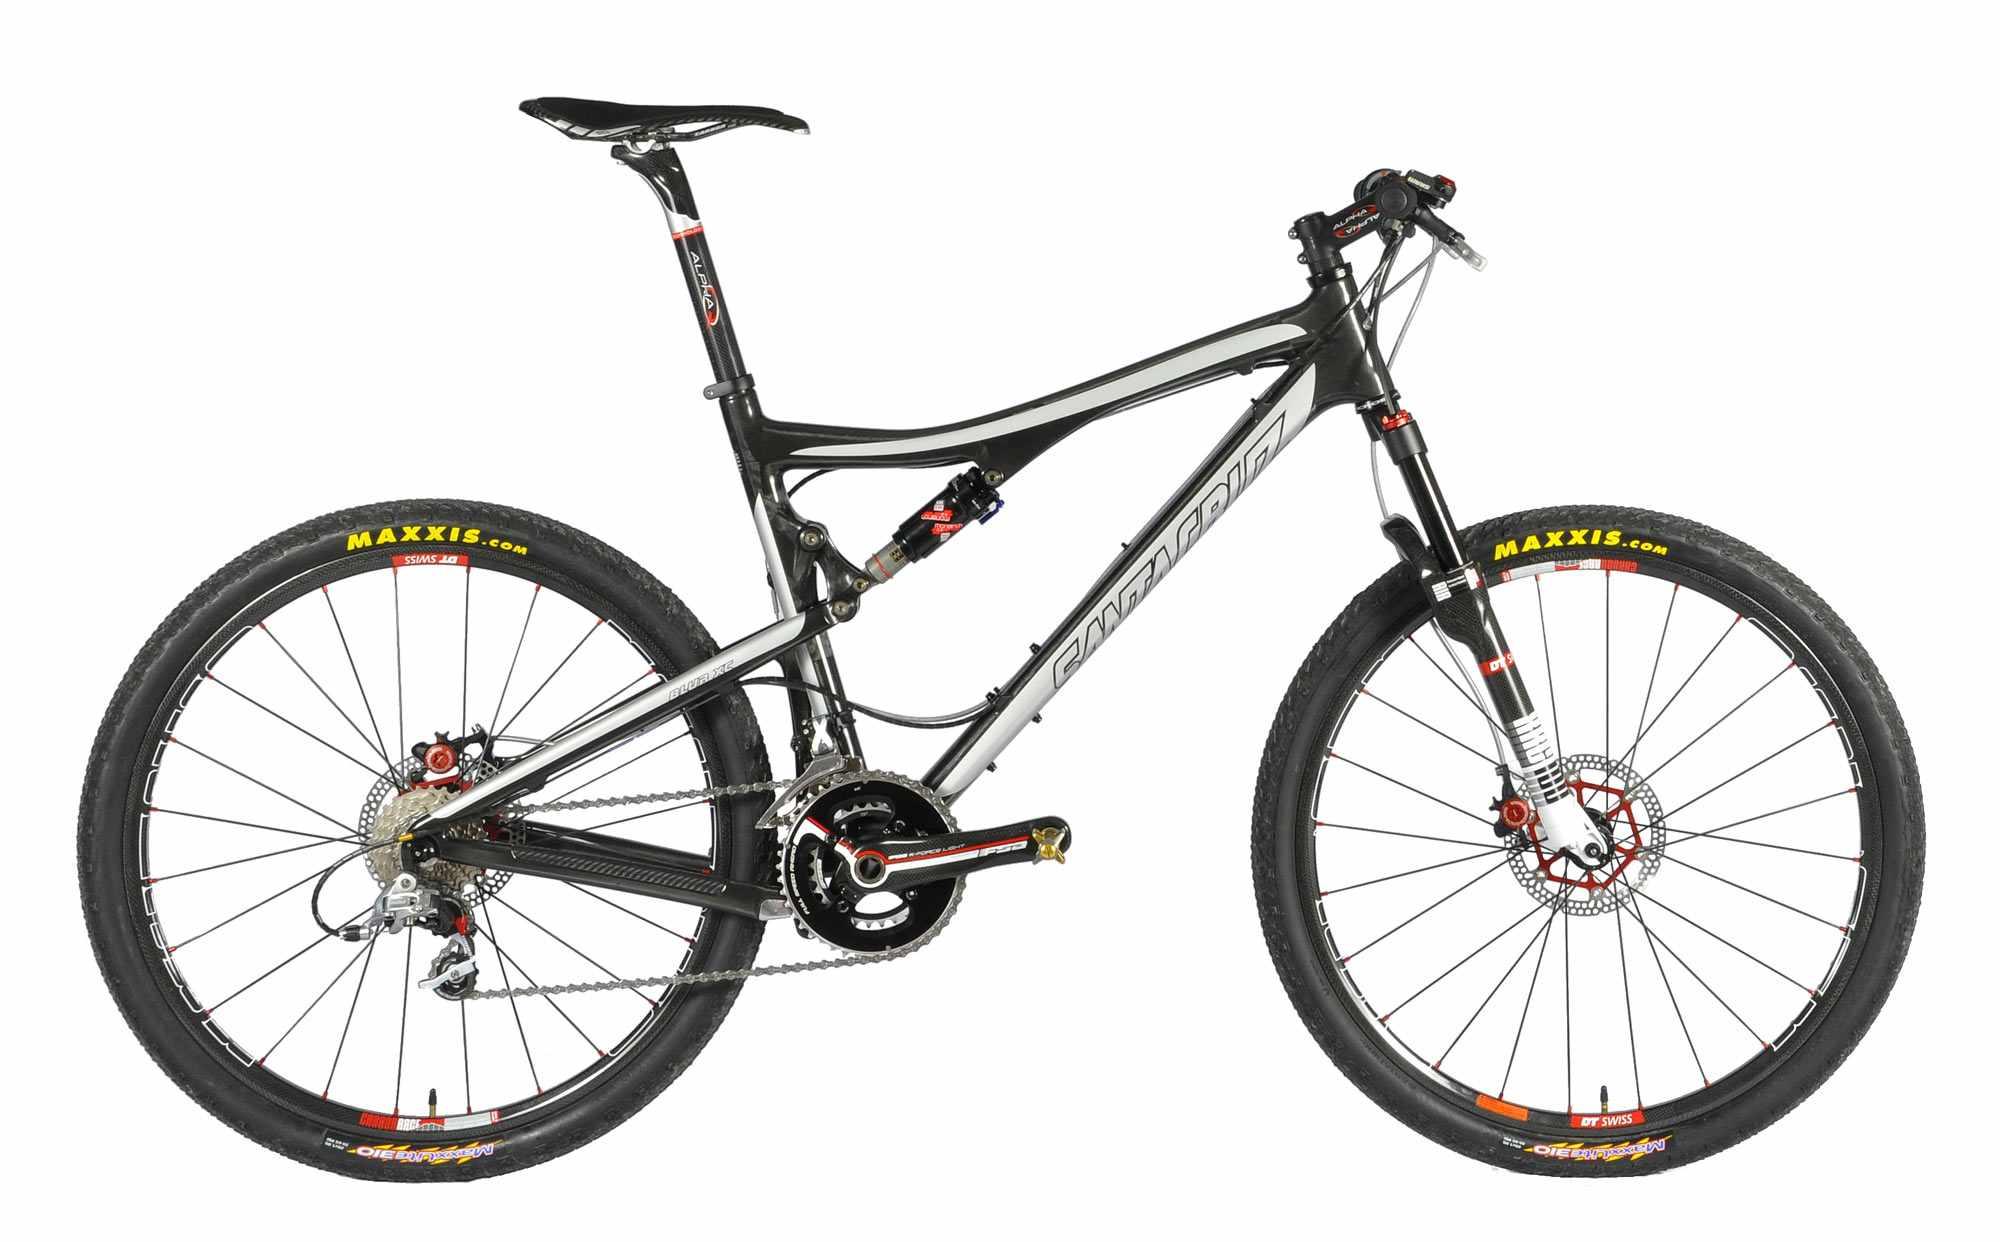 The custom Speedgoat Blur XC carbon bike.